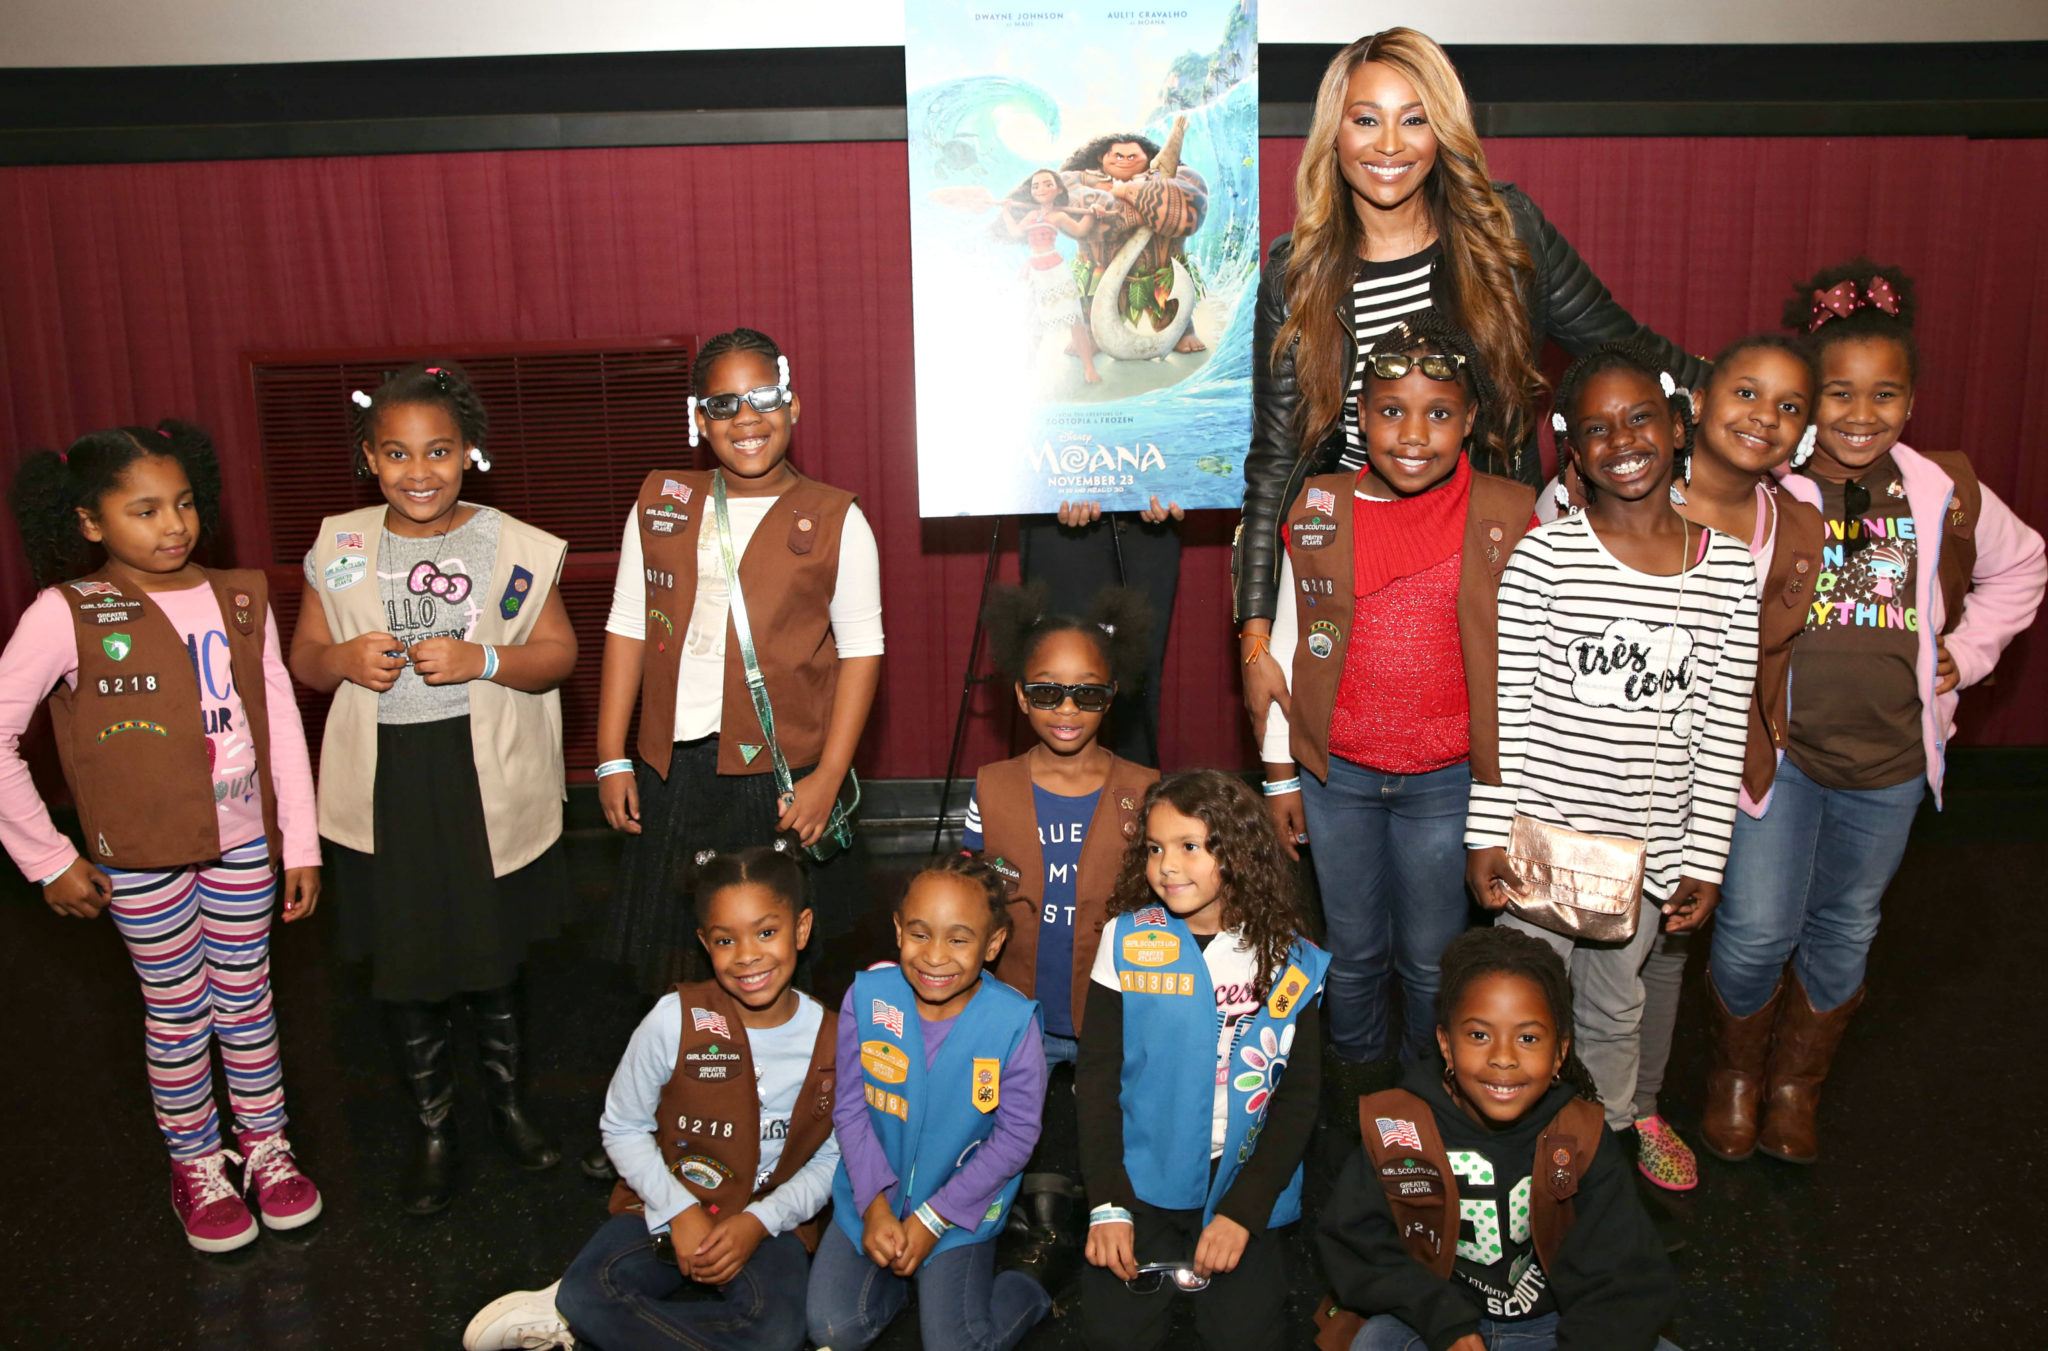 'MOANA' Private Screening In Atlanta Hosted By Cynthia Bailey